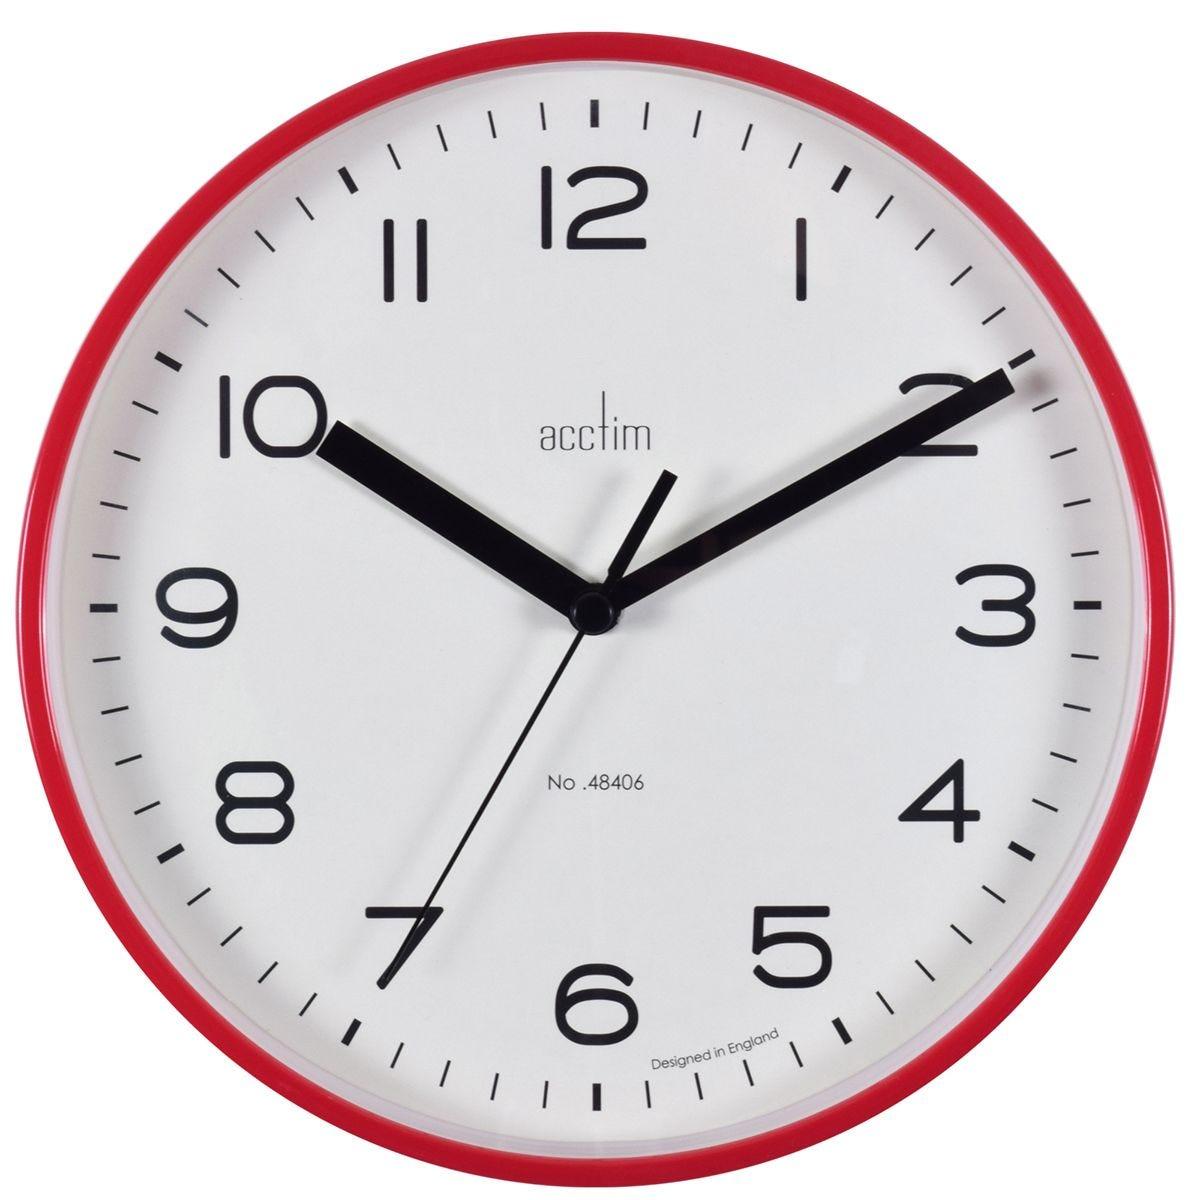 Acctim 'Runwell' Wall Clock - Shiraz Red